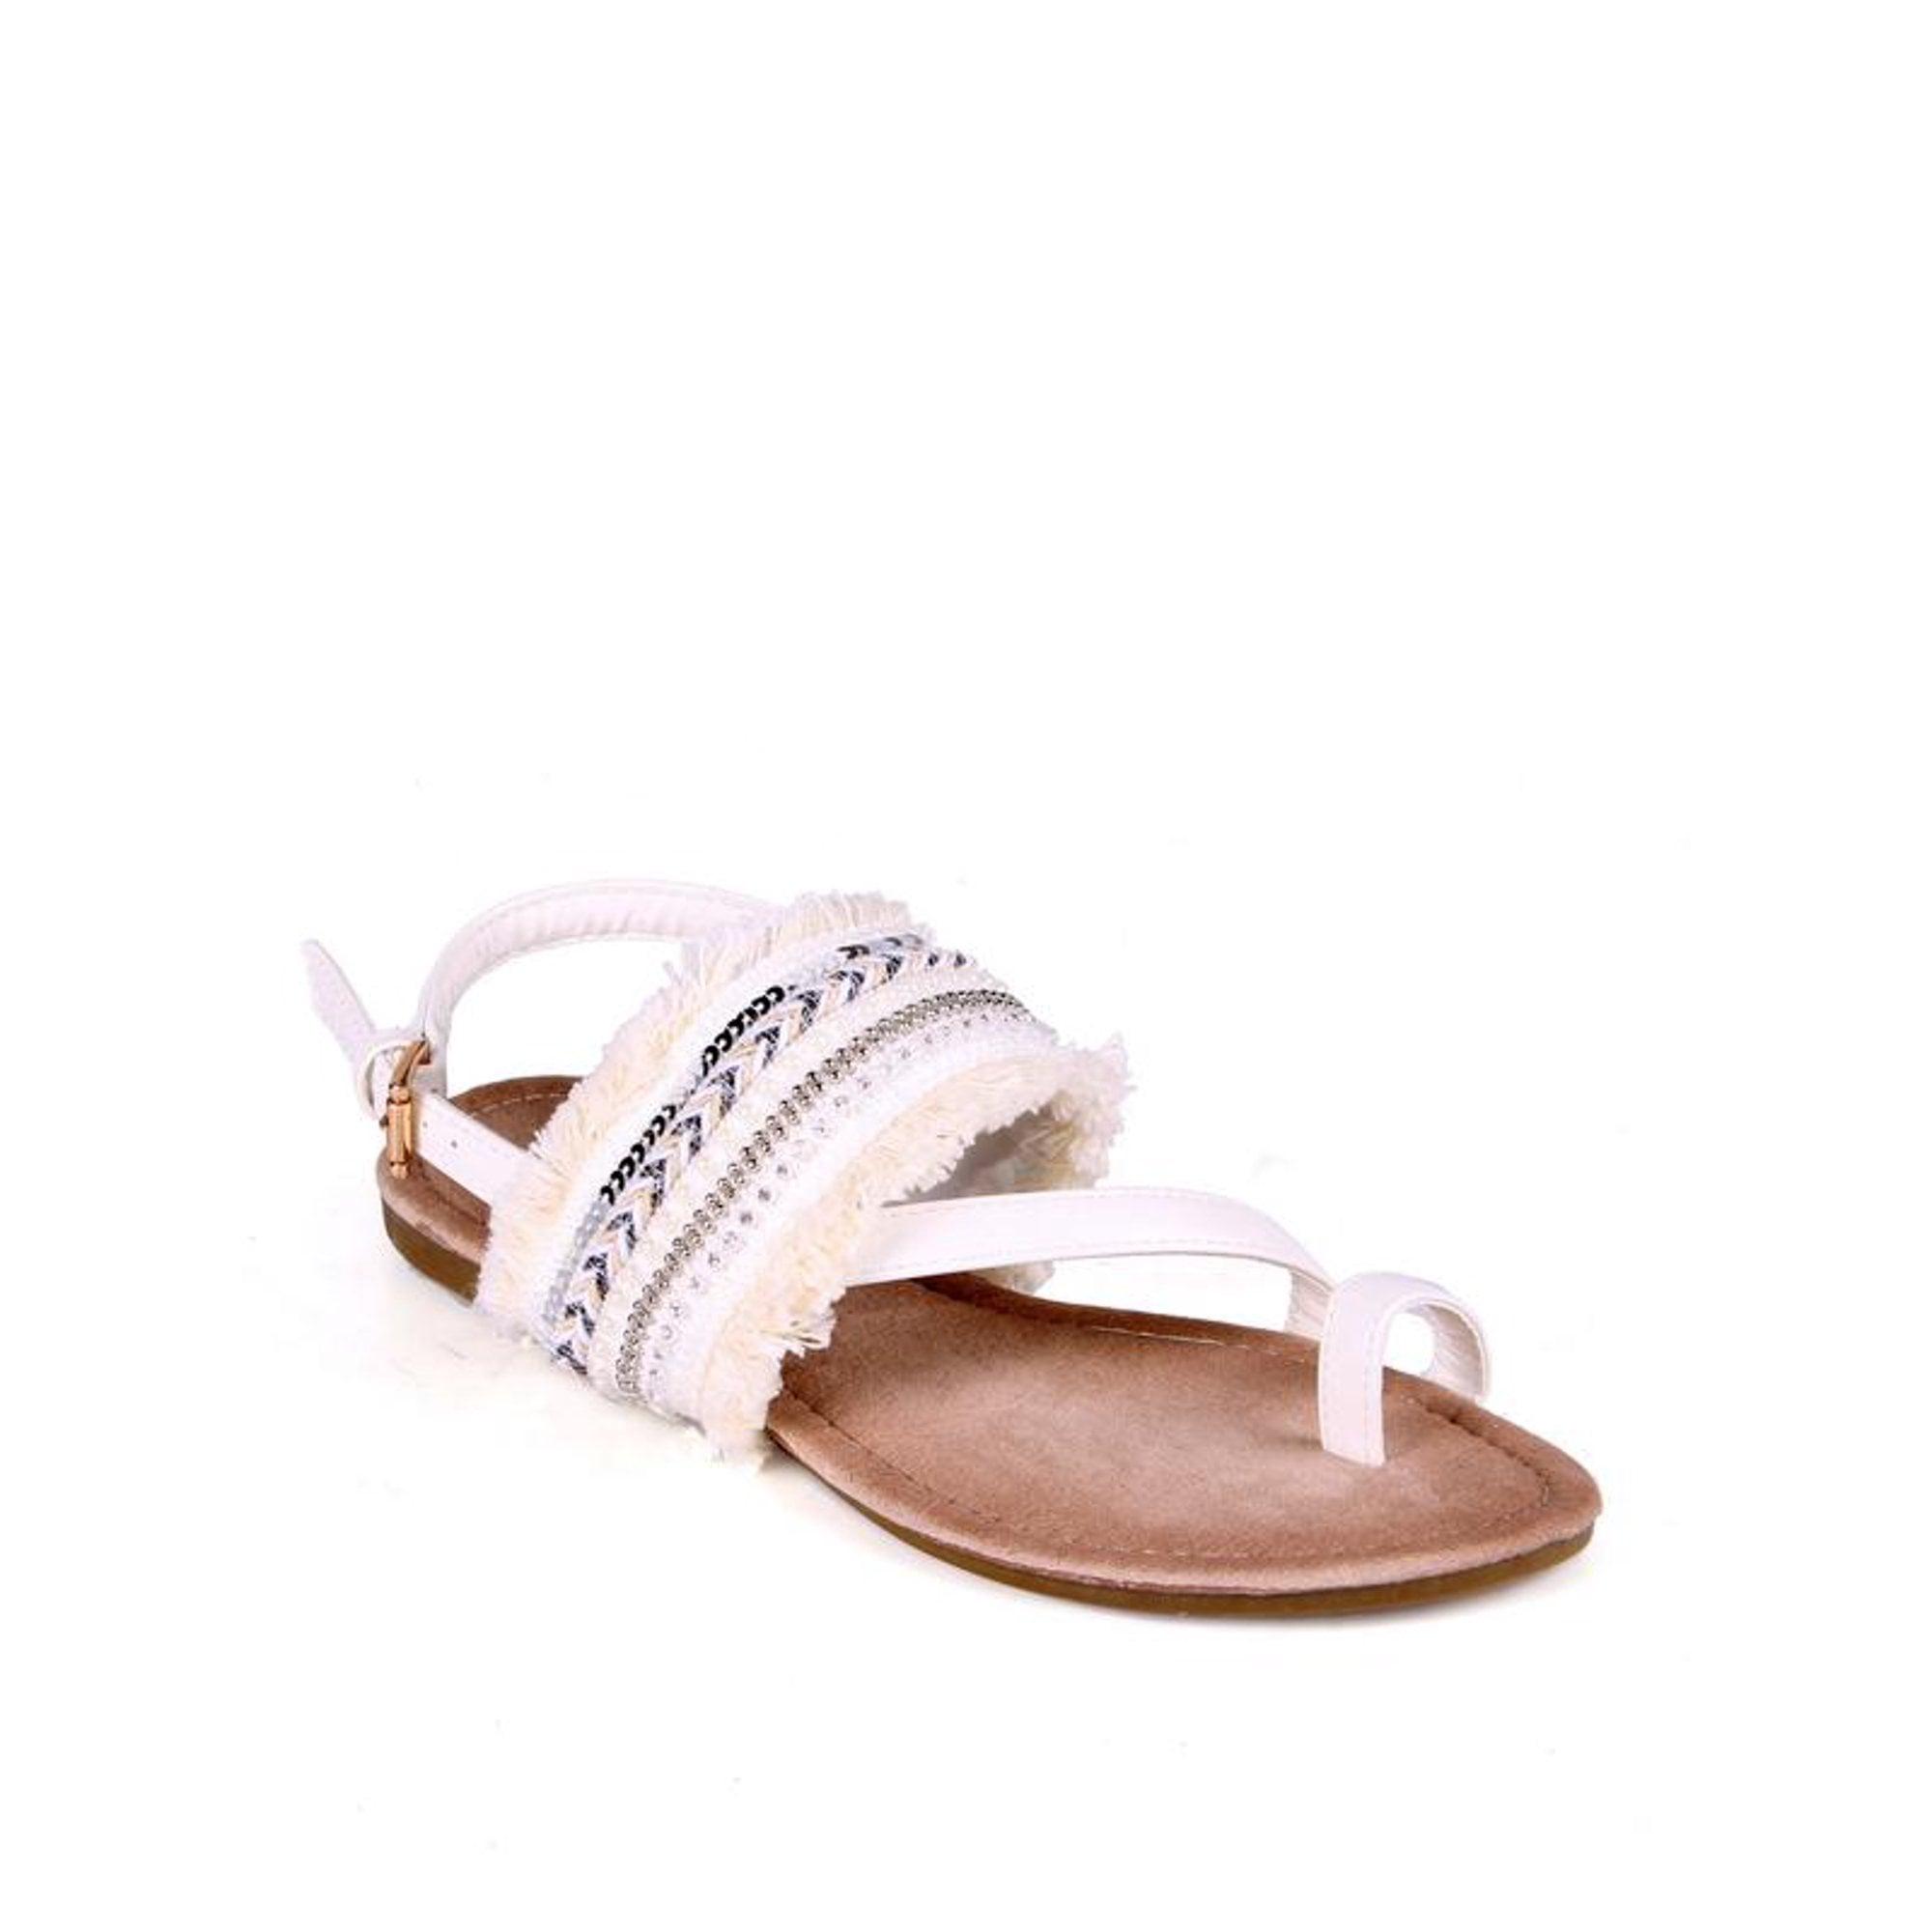 Nature Breeze Slingback Sandals | Show